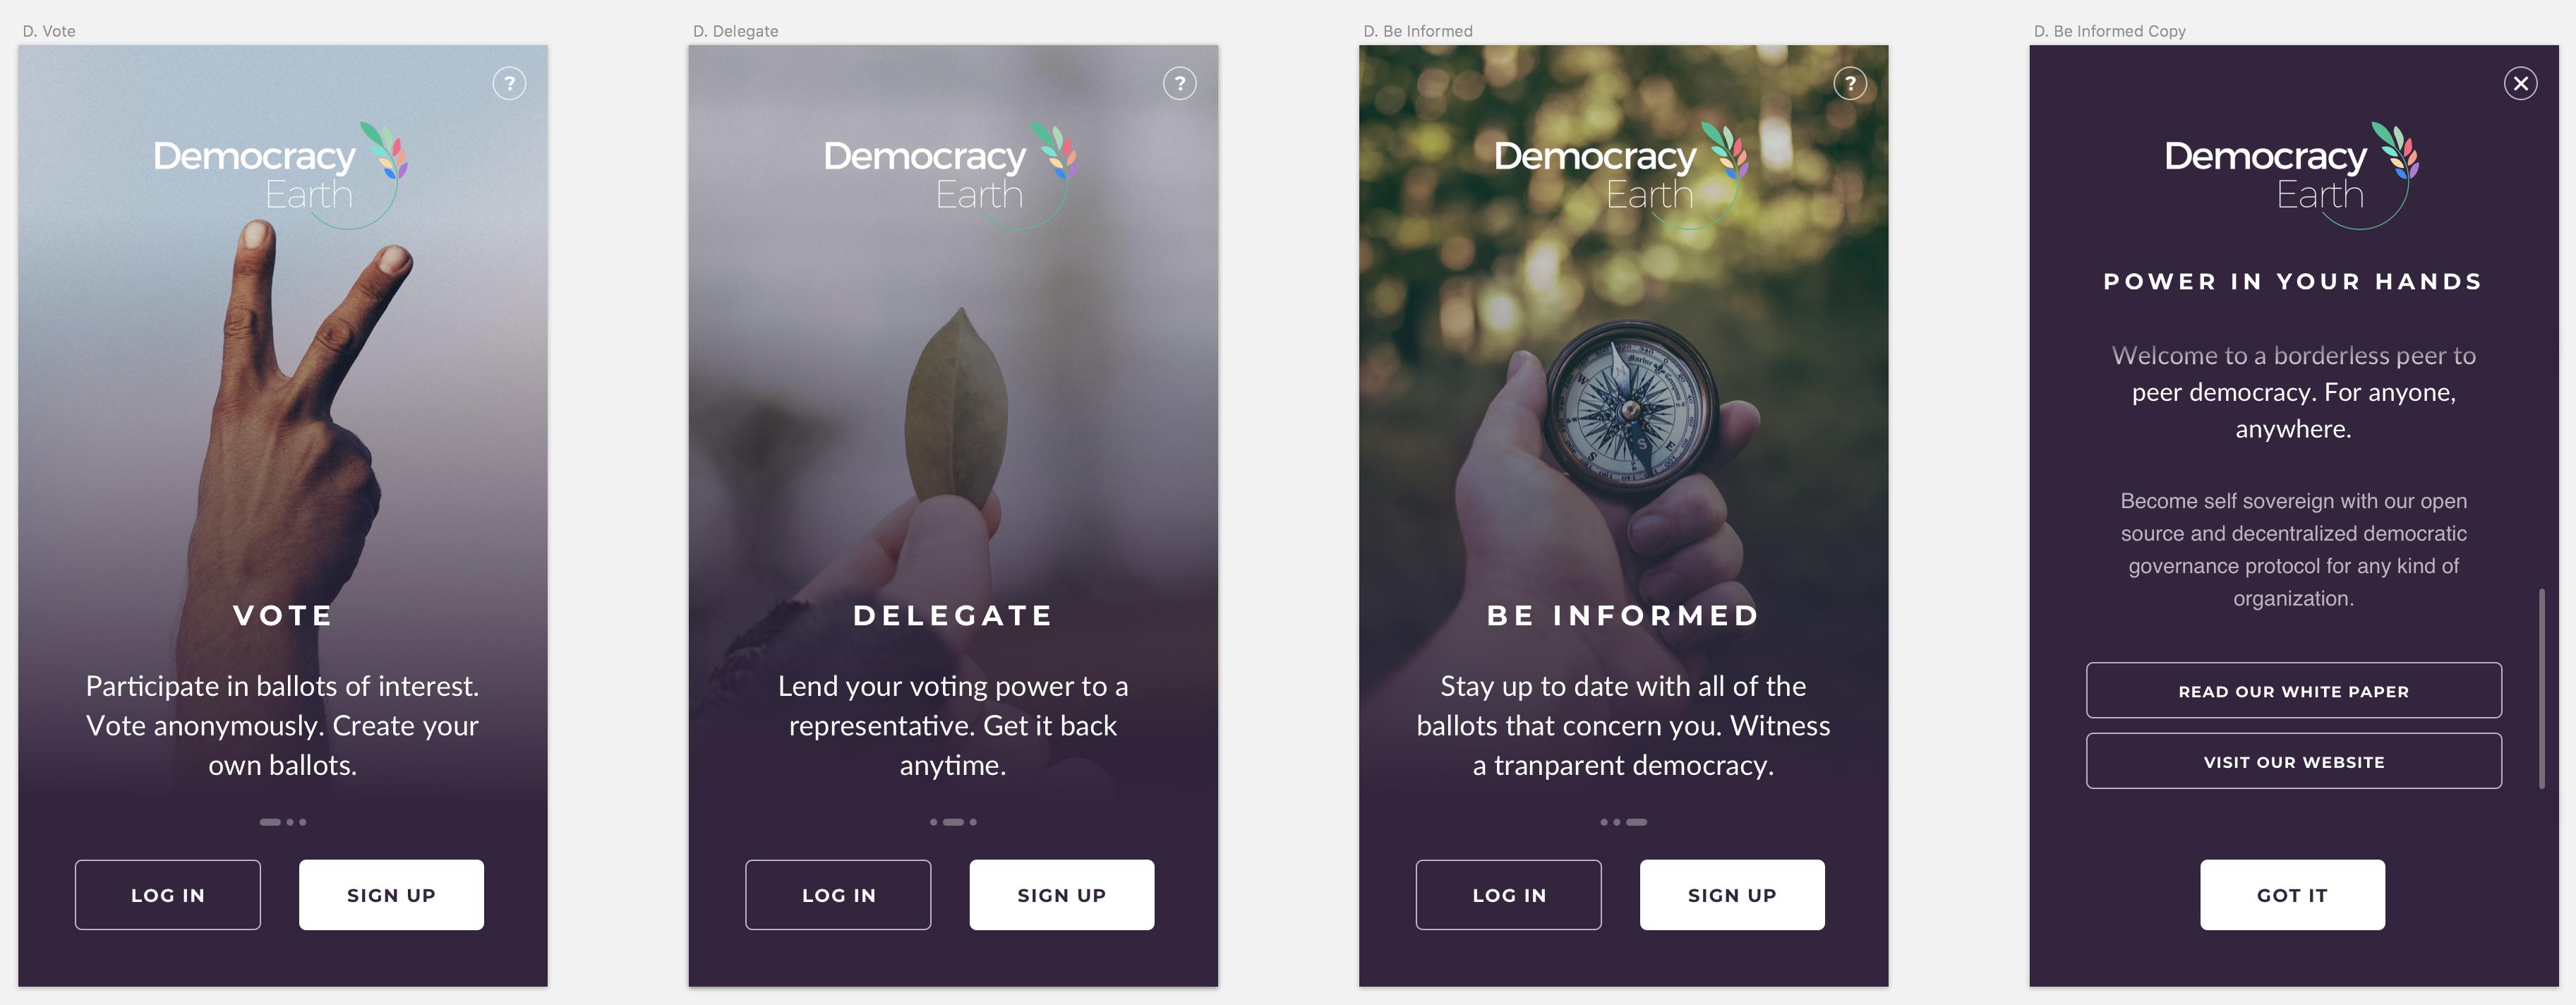 DemocracyEarth - Bountysource